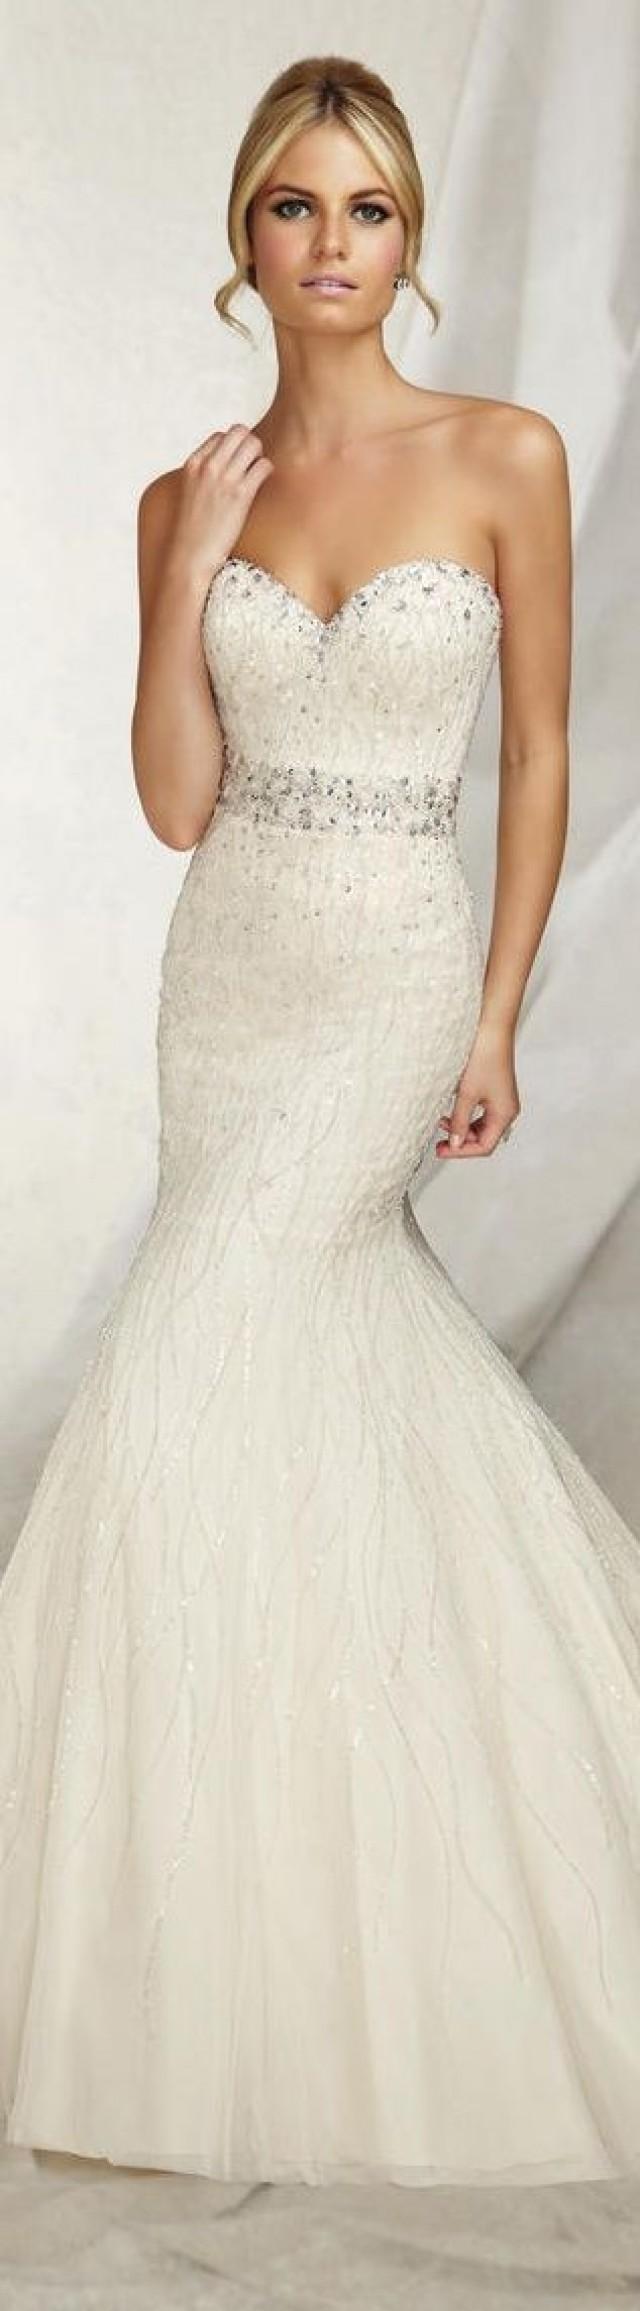 Dress Getting Hitched 2309523 Weddbook